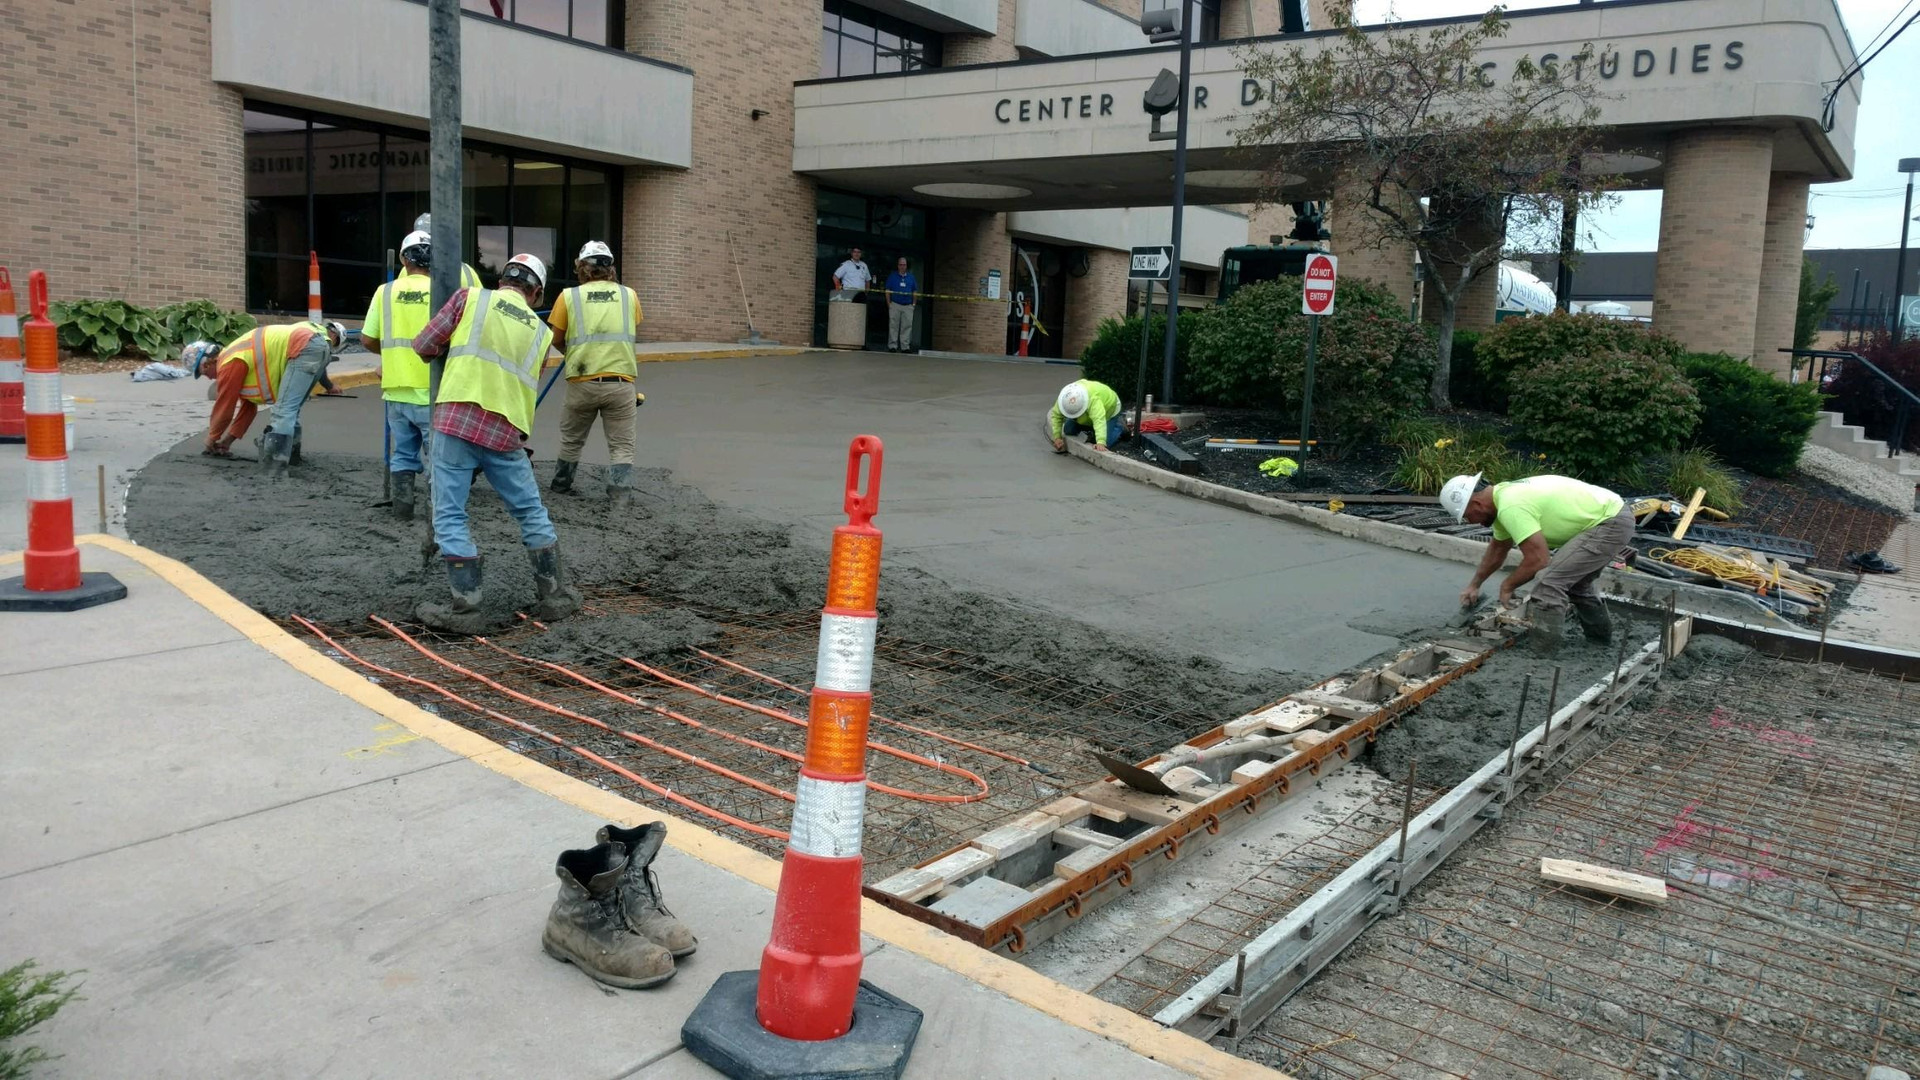 BVH Driveway Construction